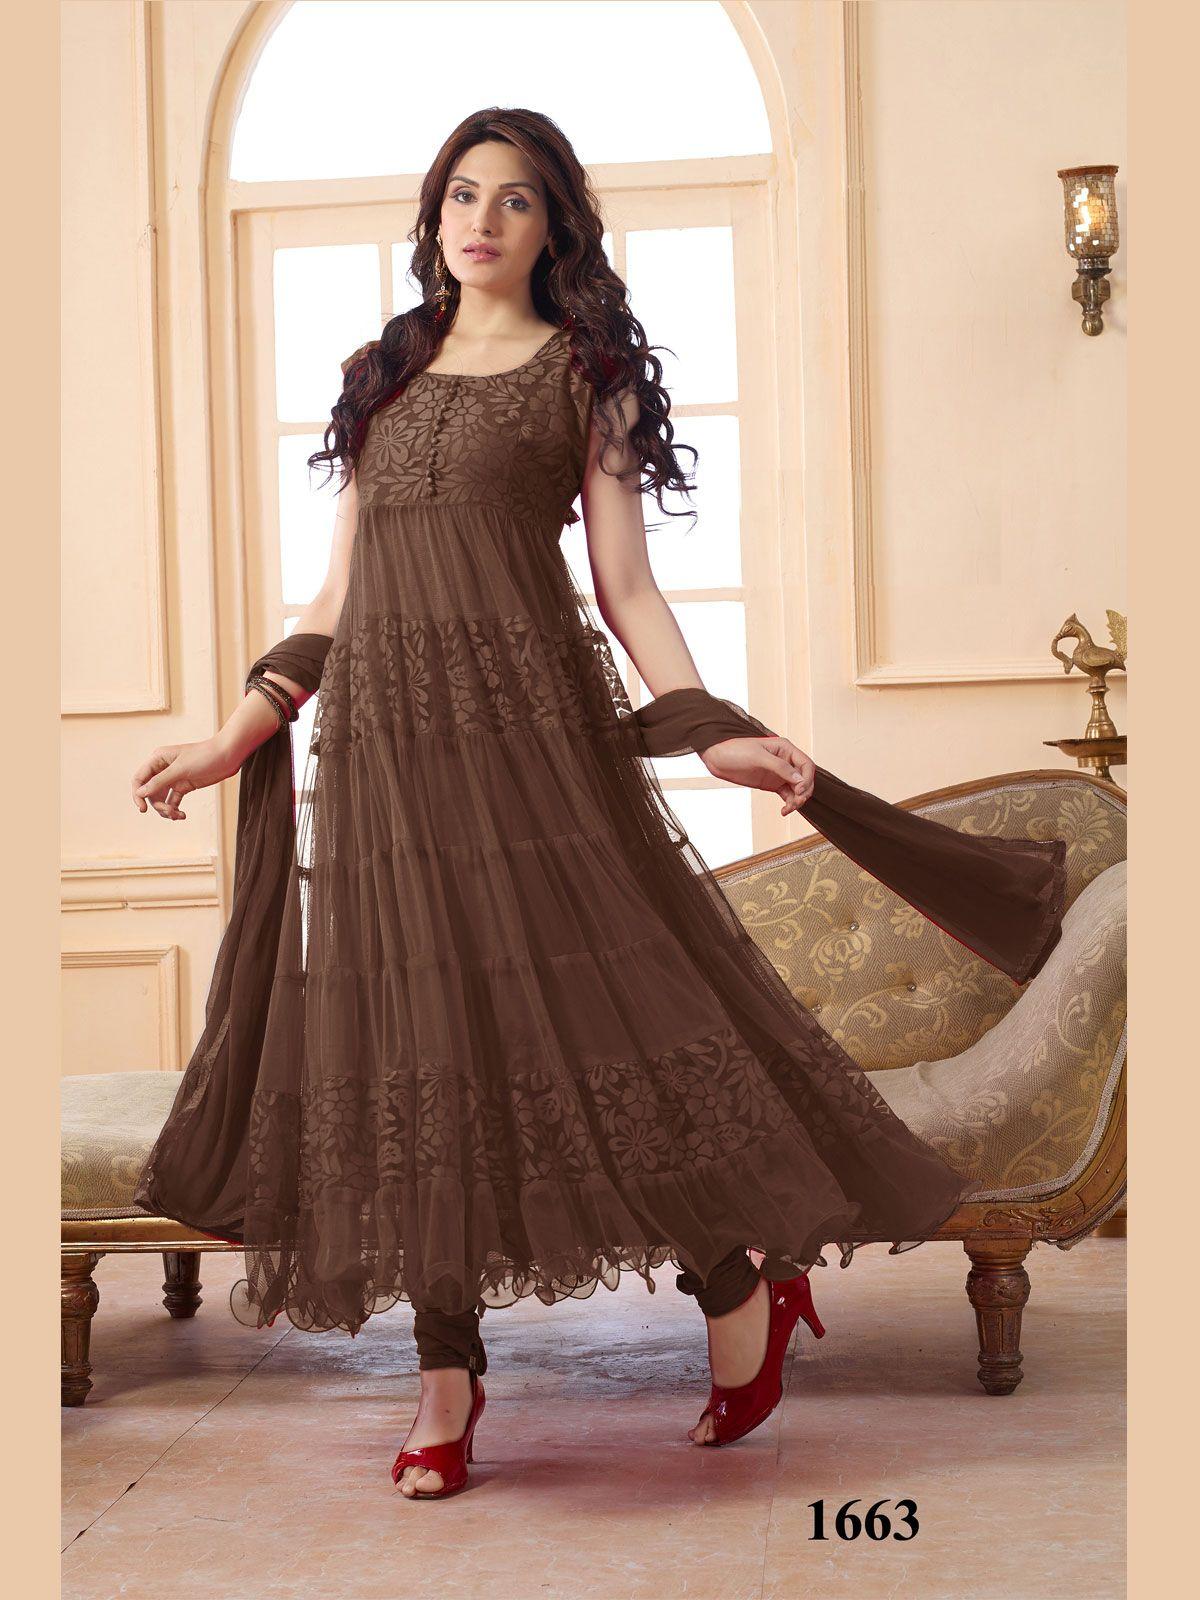 5b3d6f17d2b Khantil New Collection In Designer Dark Brown Anarkali Suits Buy Online  Rs. 799 - Contact us on 8487944854